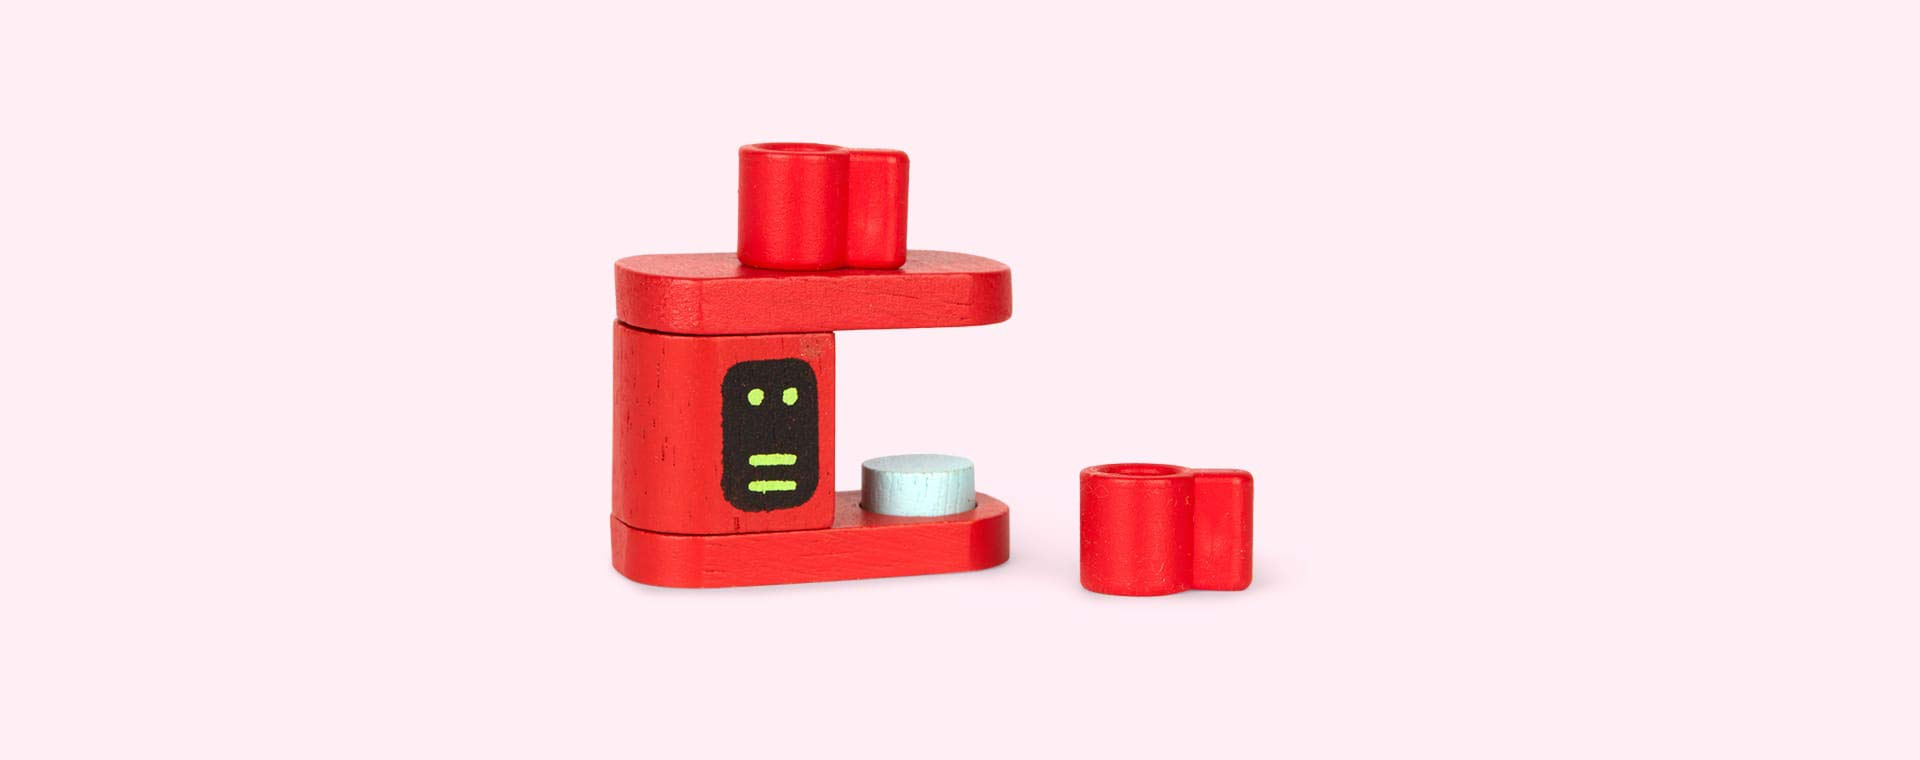 Tea Time Le Toy Van Tea Time Kitchen Accessory Pack